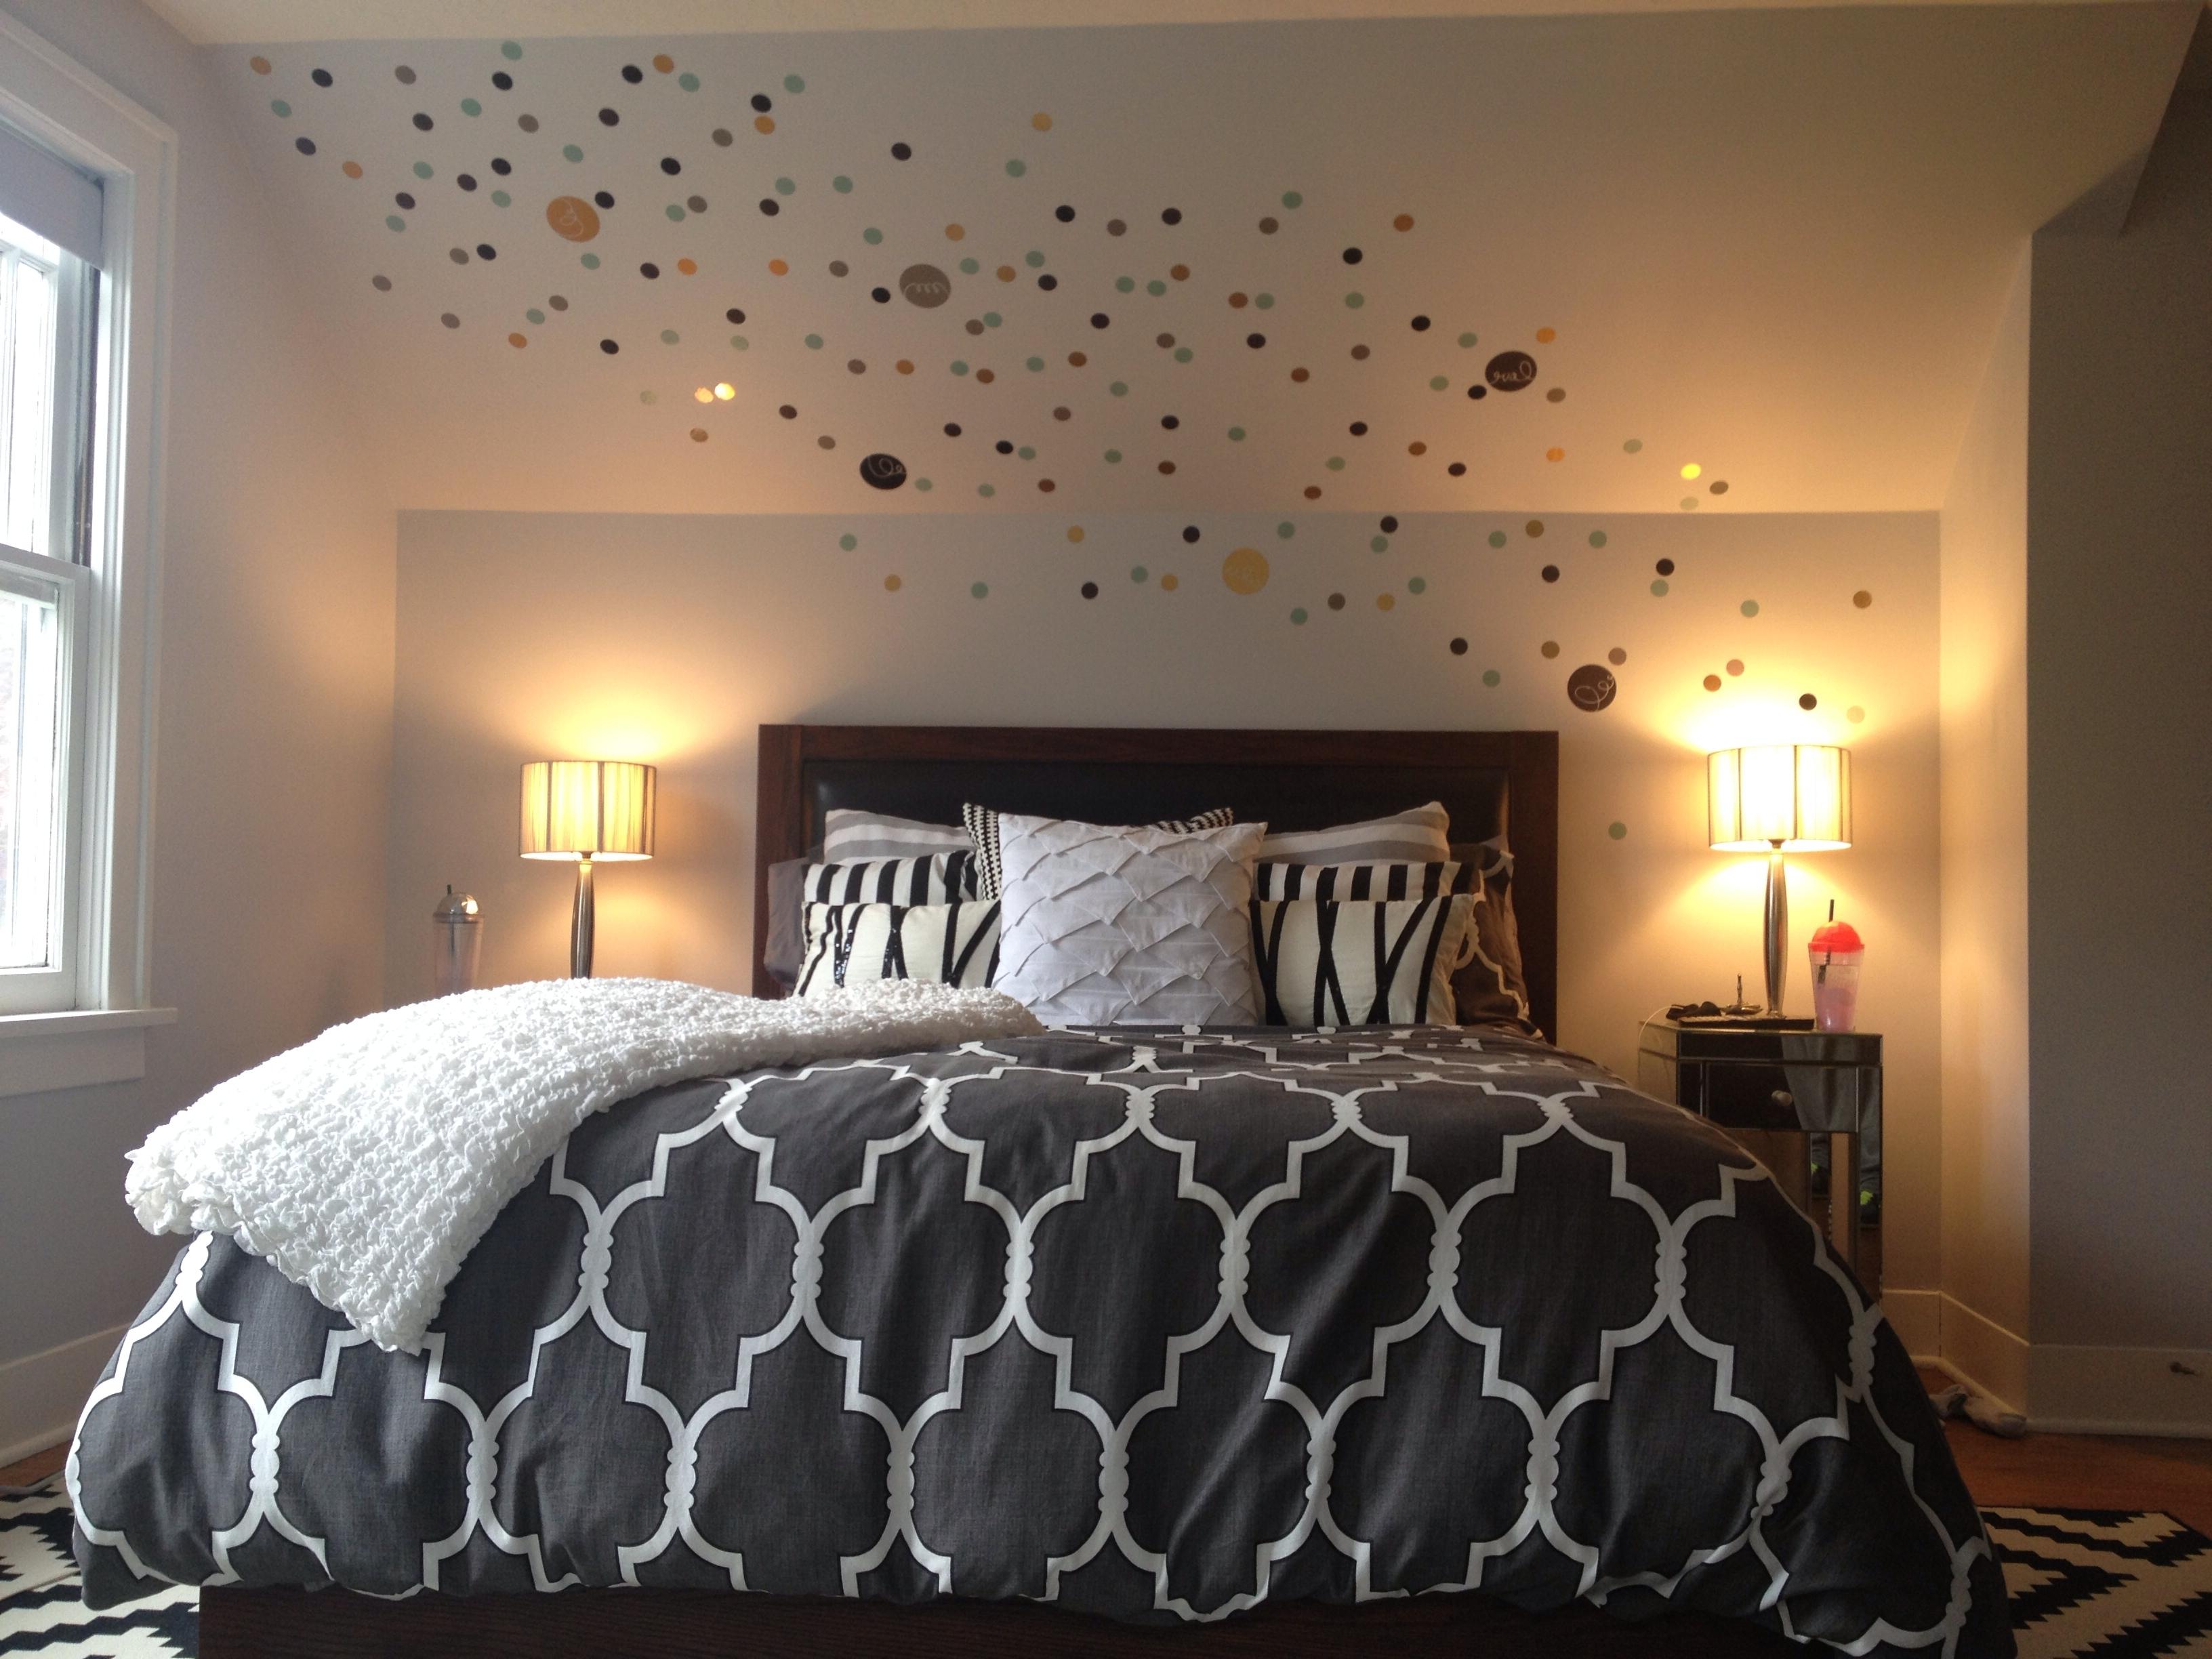 Bedroom Decor (View 1 of 15)